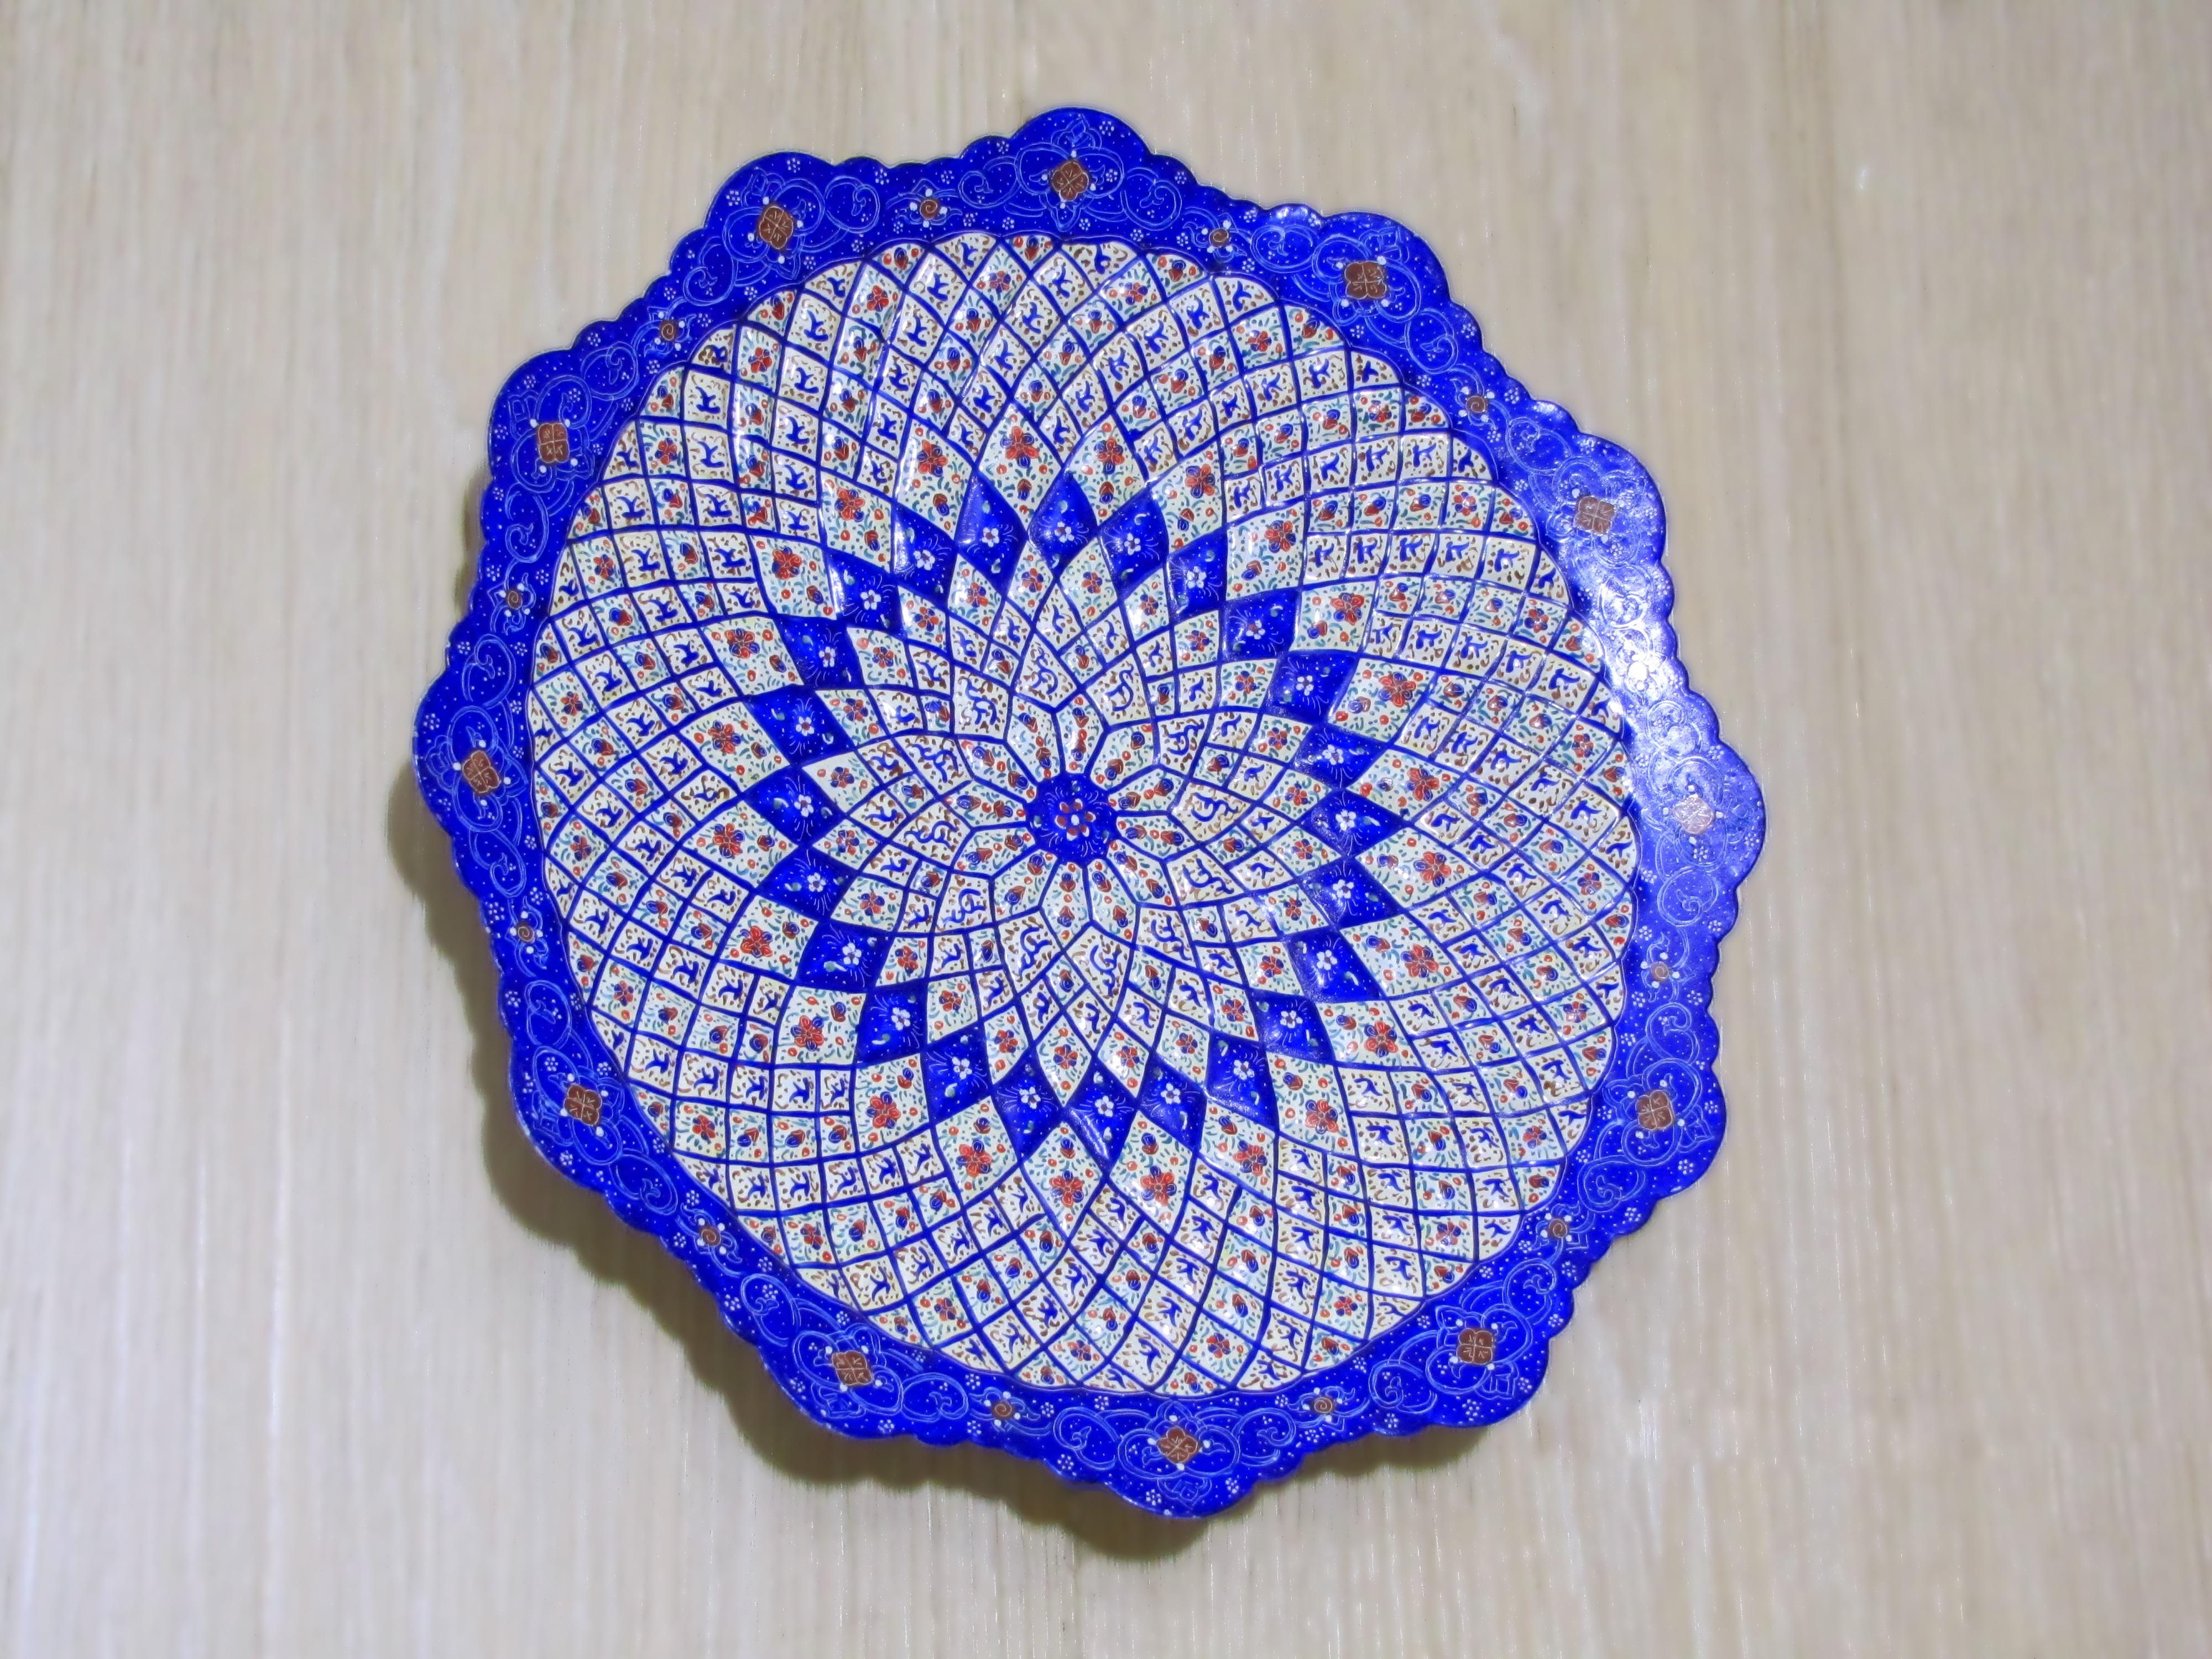 Kostenlose foto : Blume, Muster, blau, Material, häkeln, Textil ...